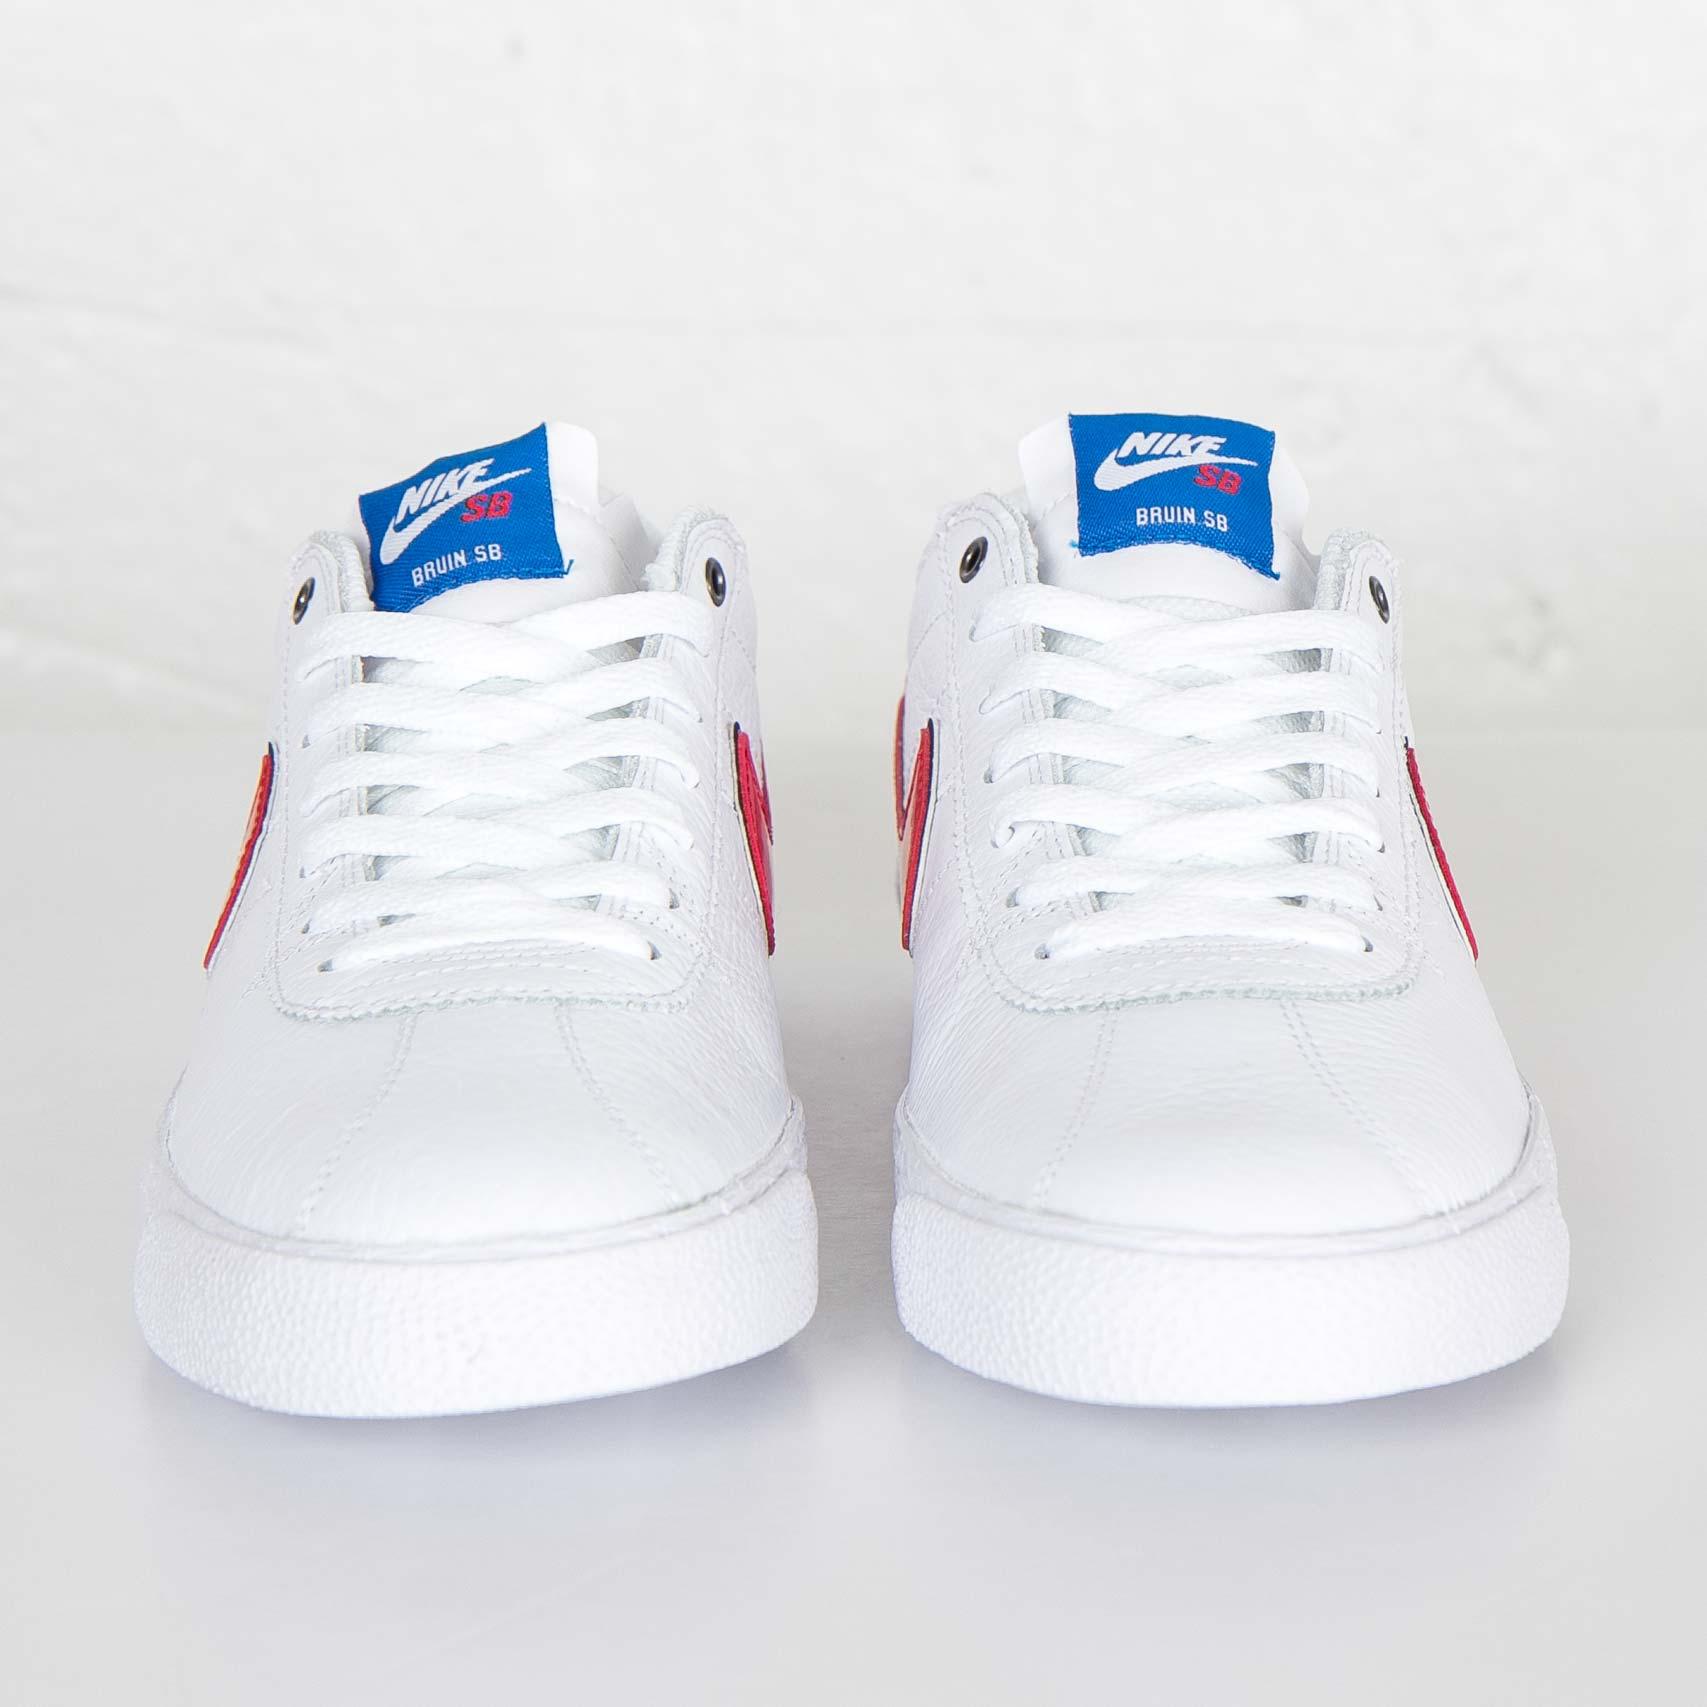 100% authentic 0449e ba3ec Nike Bruin SB Premium SE QS - 716814-164 - Sneakersnstuff   sneakers    streetwear online since 1999